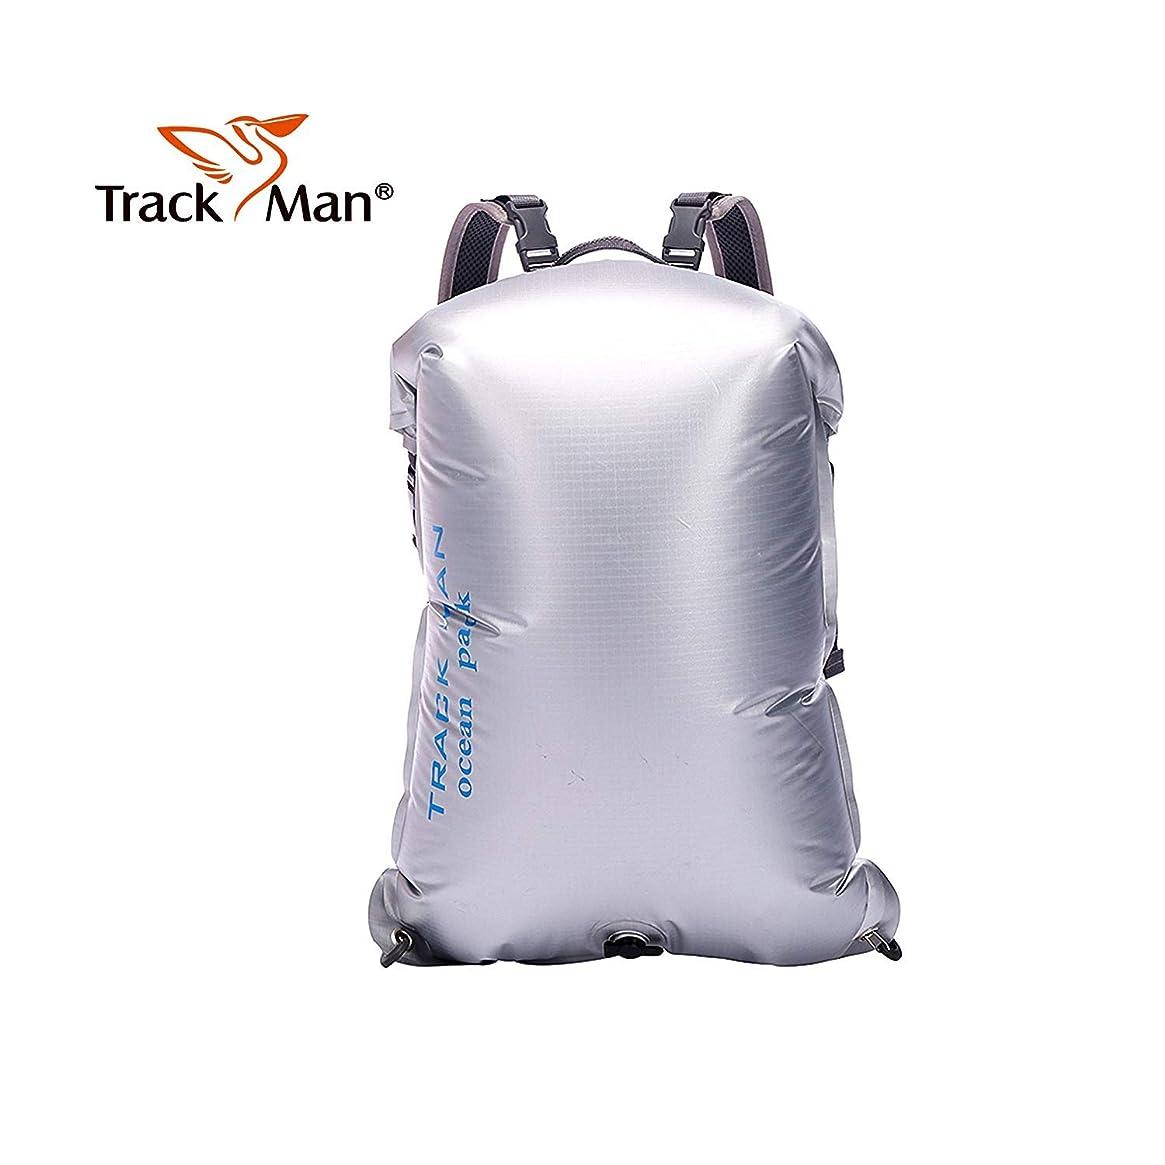 Track Man Floating Waterproof 2L/5L/15L/20L Premium PVC Waterproof Floating Dry Gear Bags for Boating, Kayaking, Fishing, Rafting, Swimming and Camping